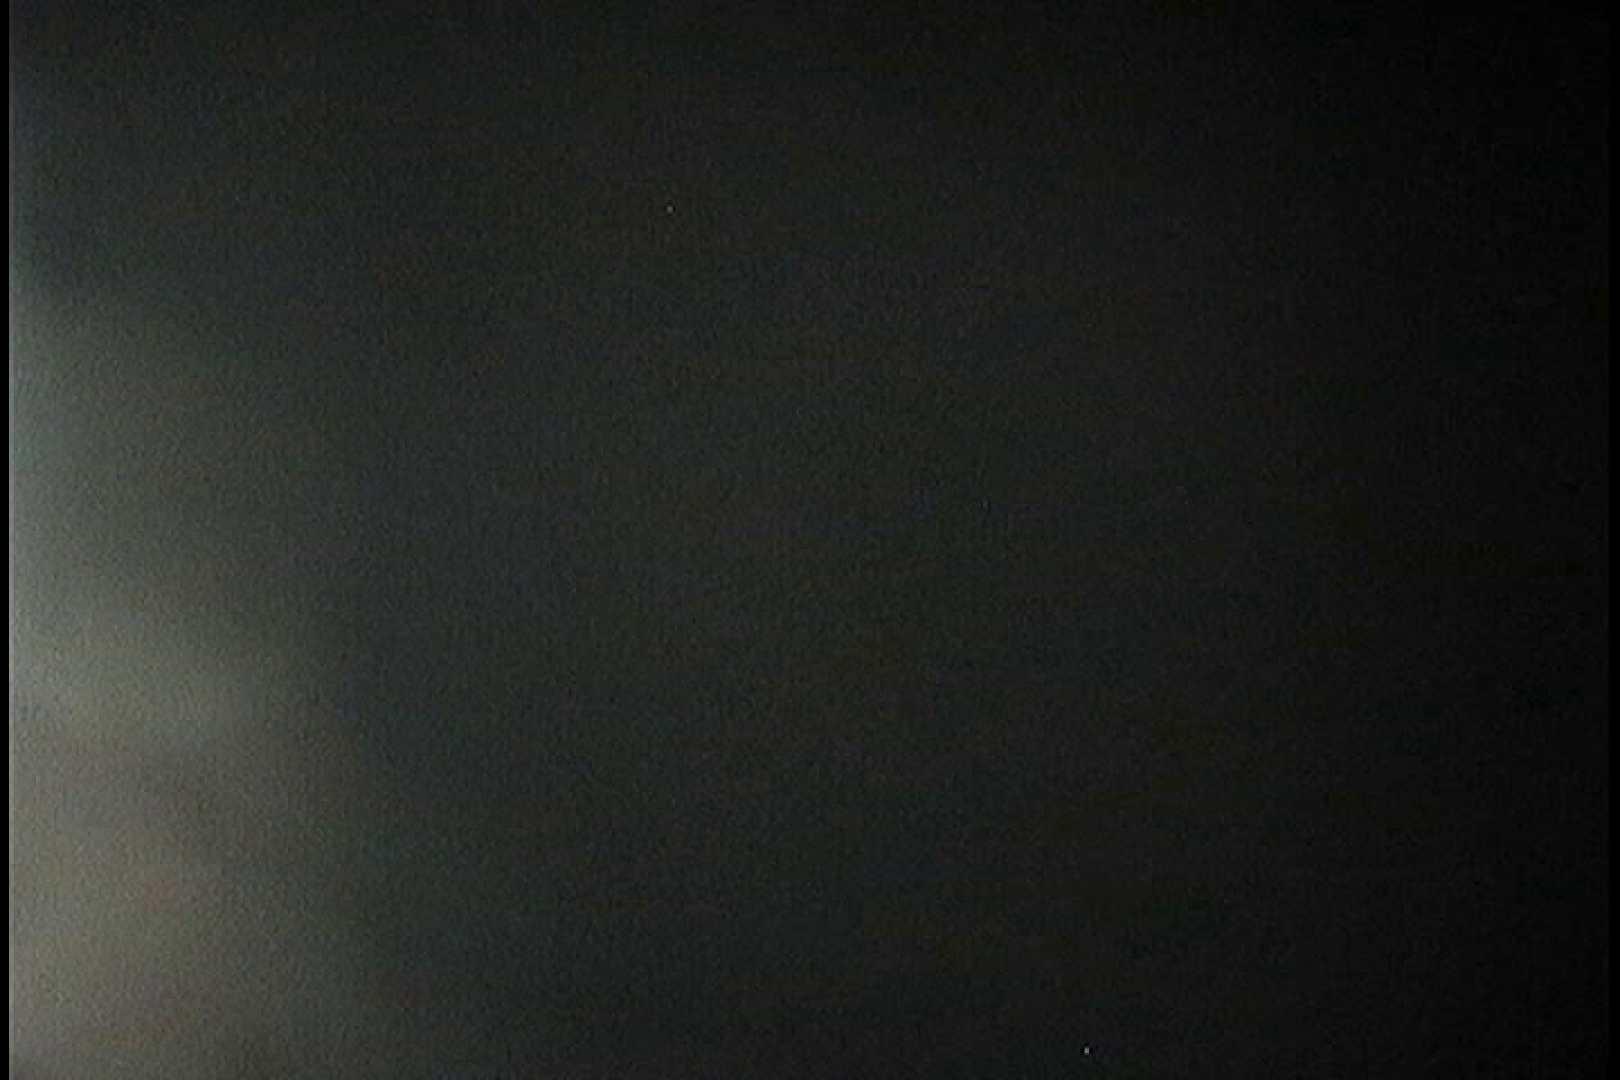 No.22 日焼け跡とオッパイの関係がおかしな貧乳ギャル 日焼け | ギャルエロ画像  89PICs 5